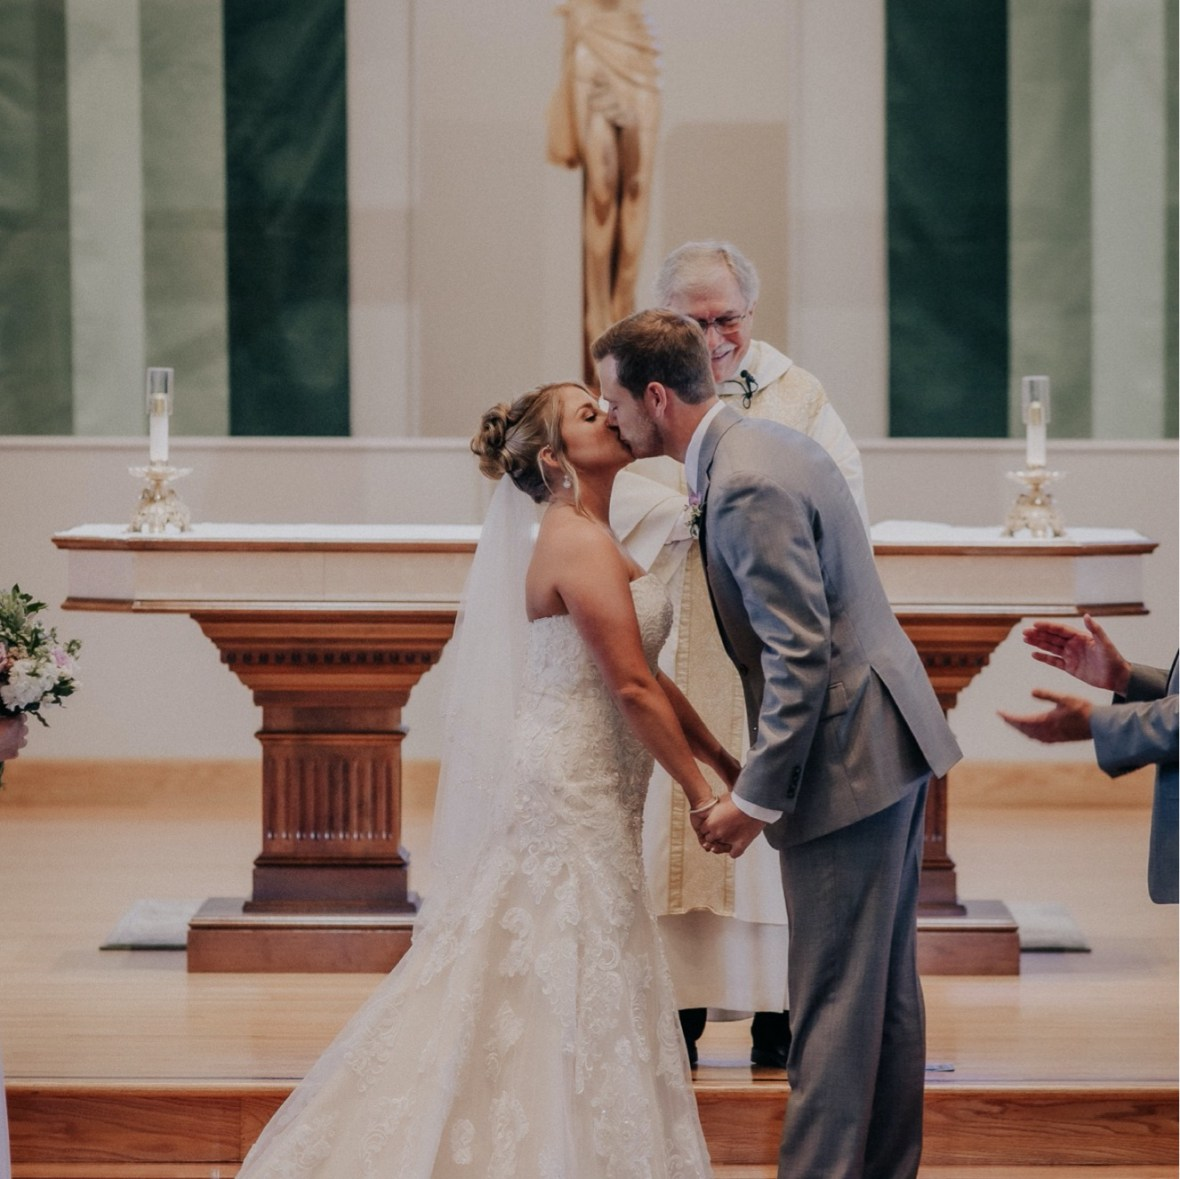 31_WTCM8836ab_oldham_Rustic_Summer_County_Kentucky_Wedding_Grange_La_Crestwood